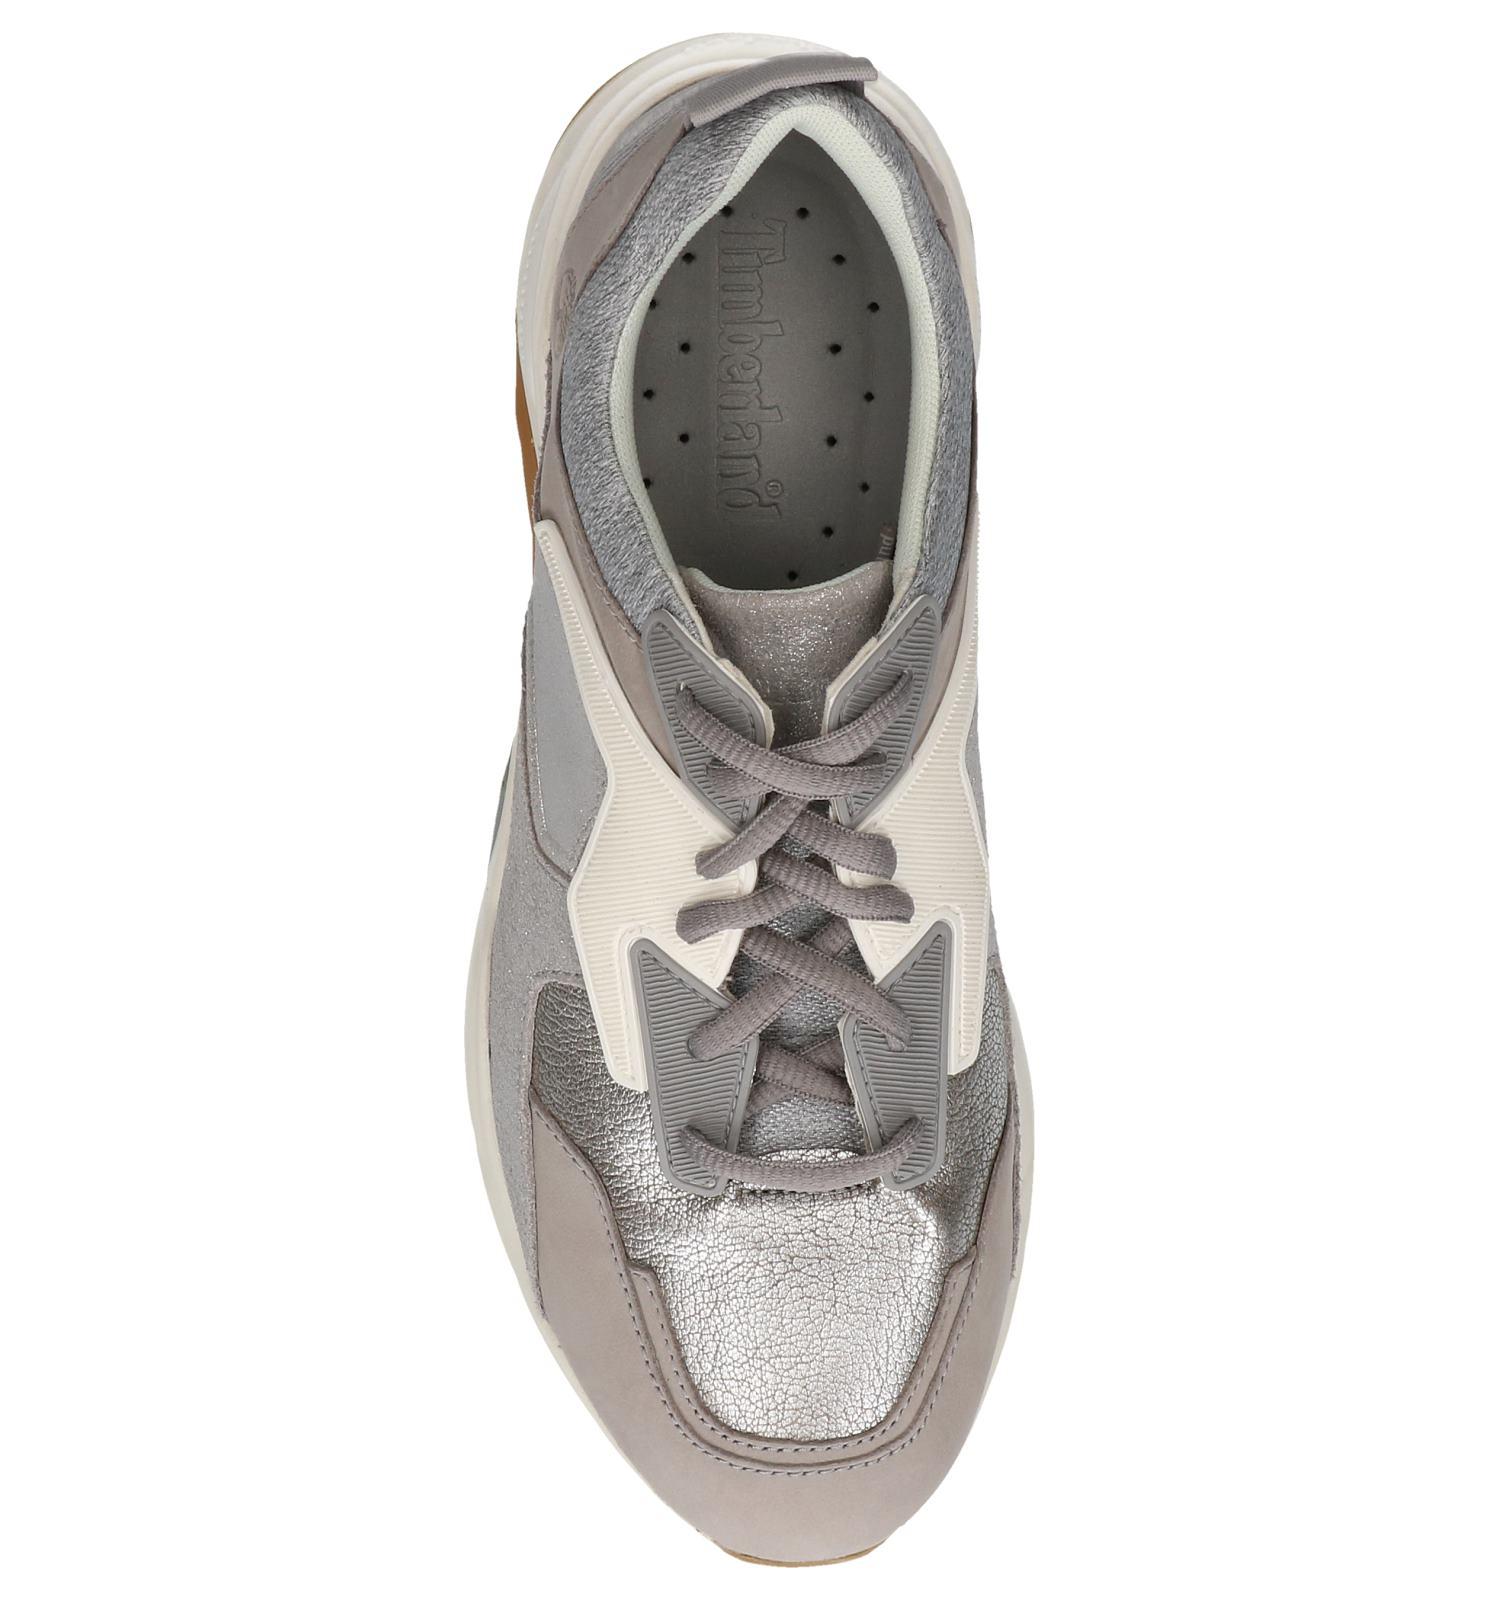 Zwarte Lage Sneakers Timberland Delphiville | SCHOENENTORFS